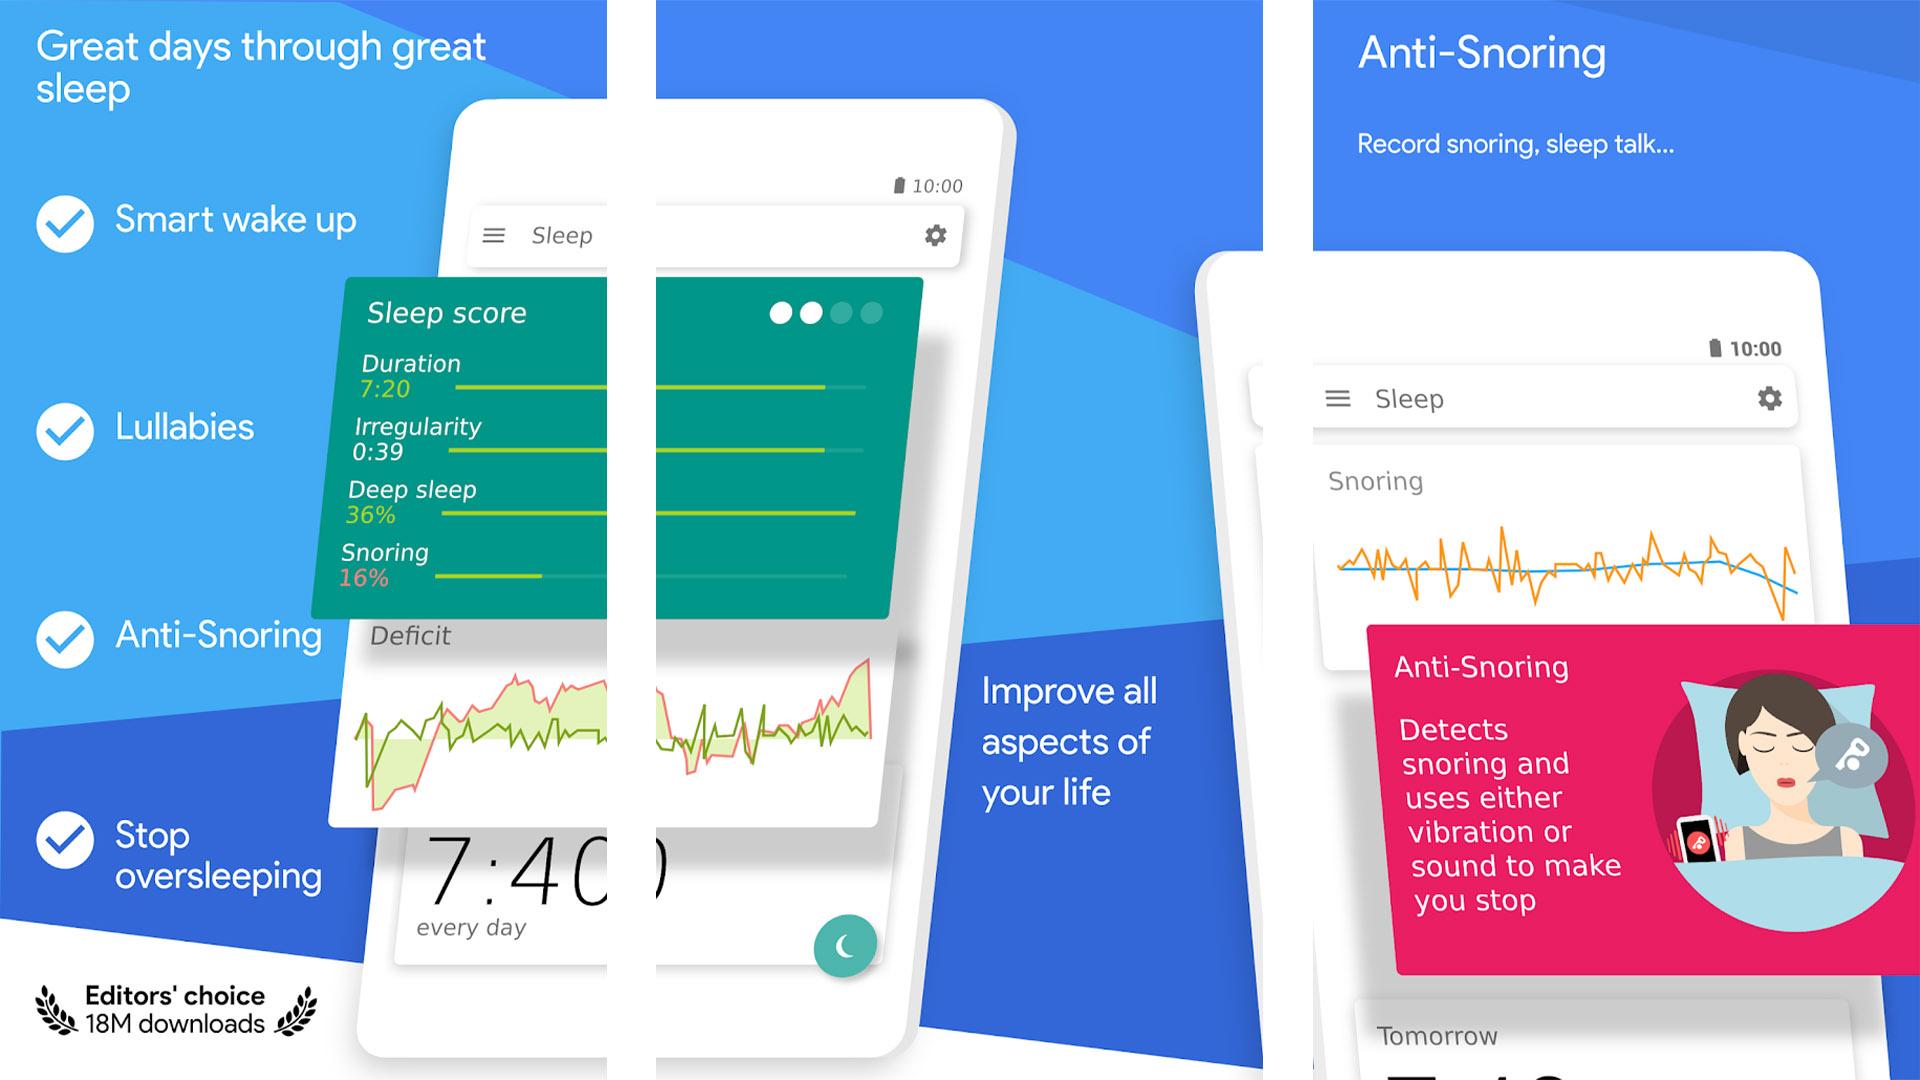 Sleep as Android screenshot 2020